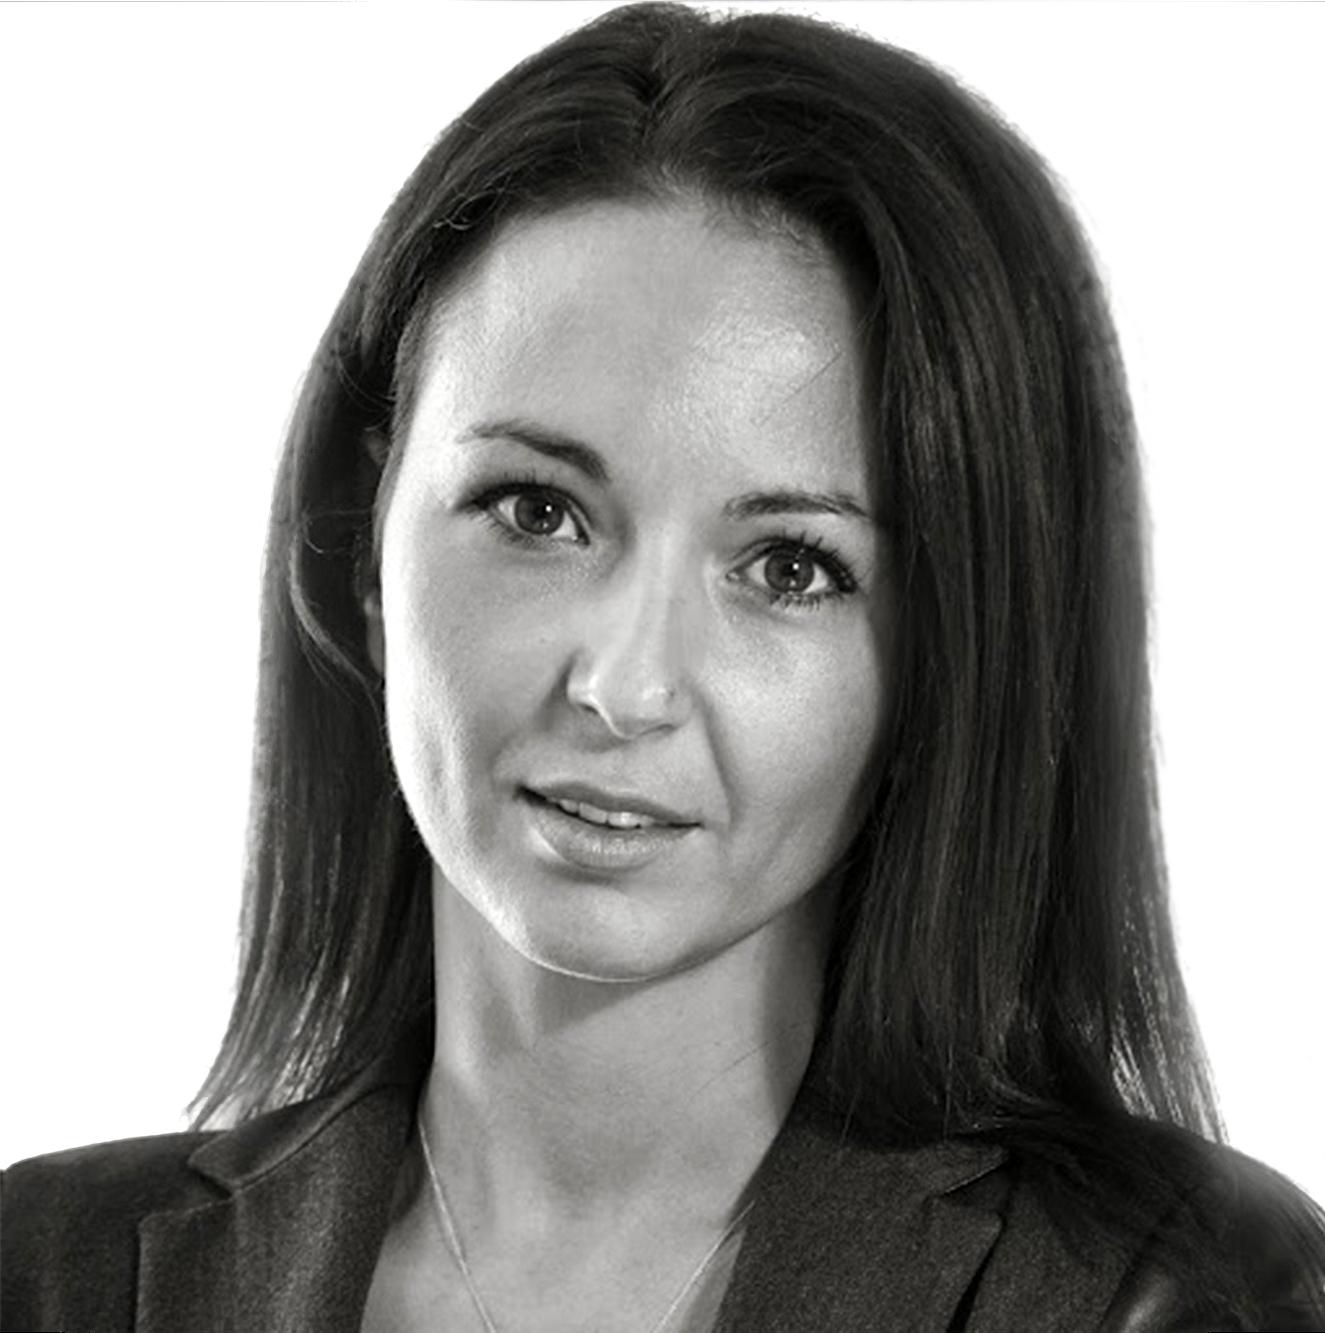 DESISLAVA KALISKOVA